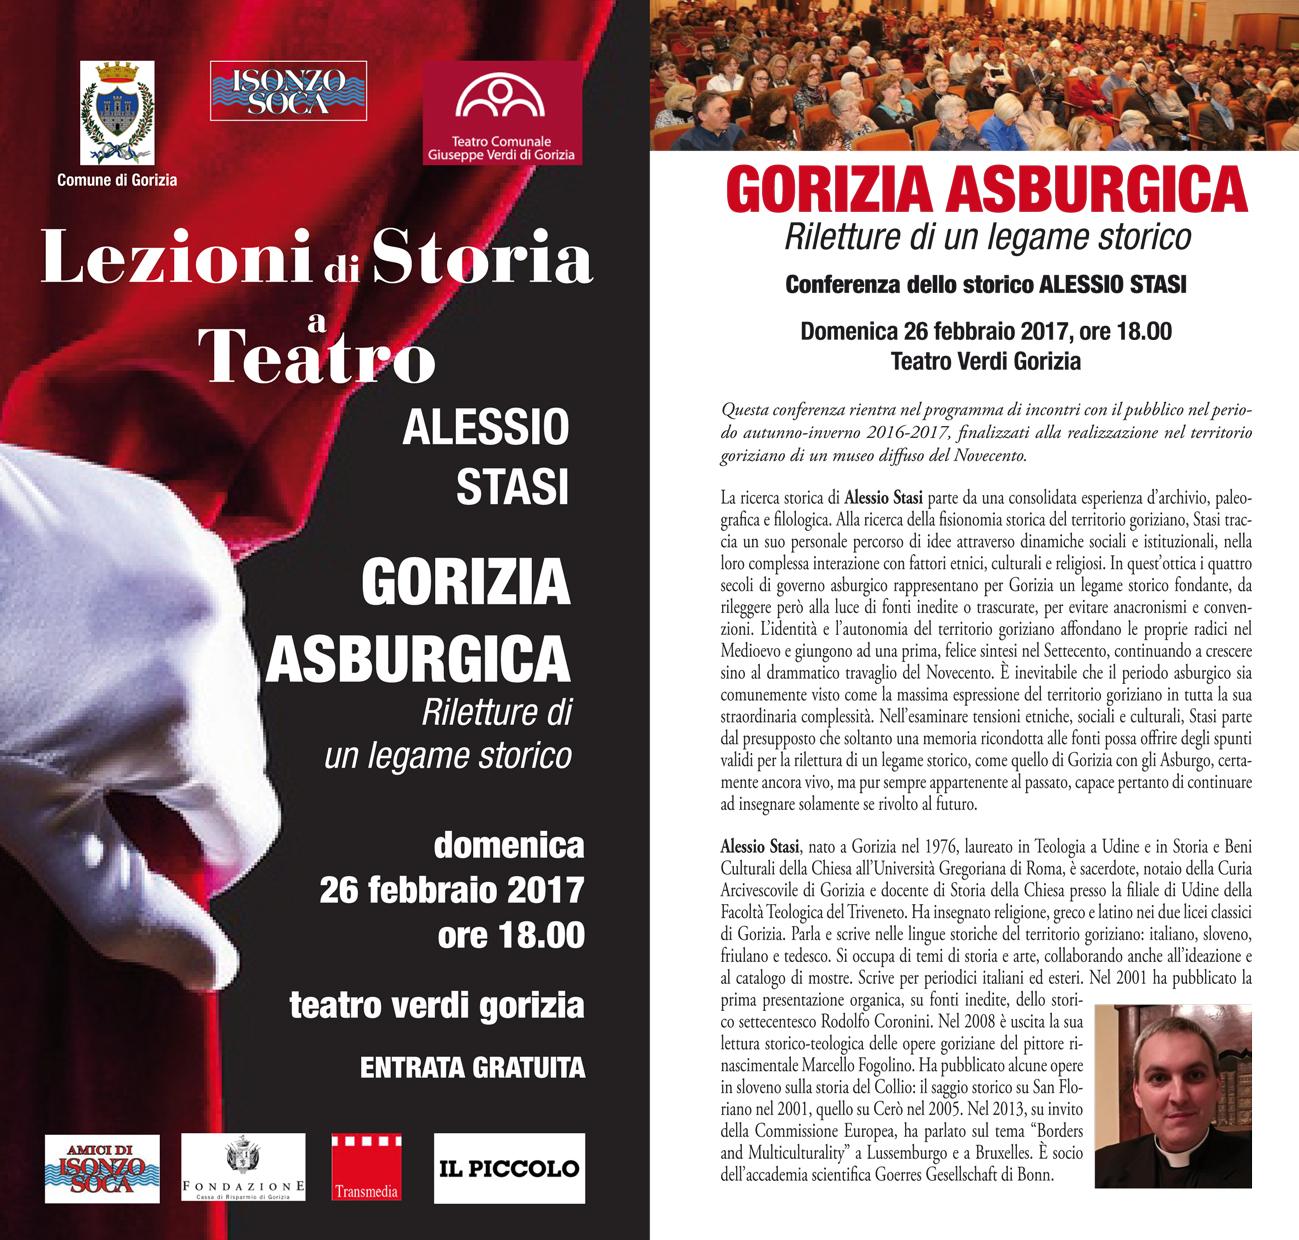 Gorizia asburgica